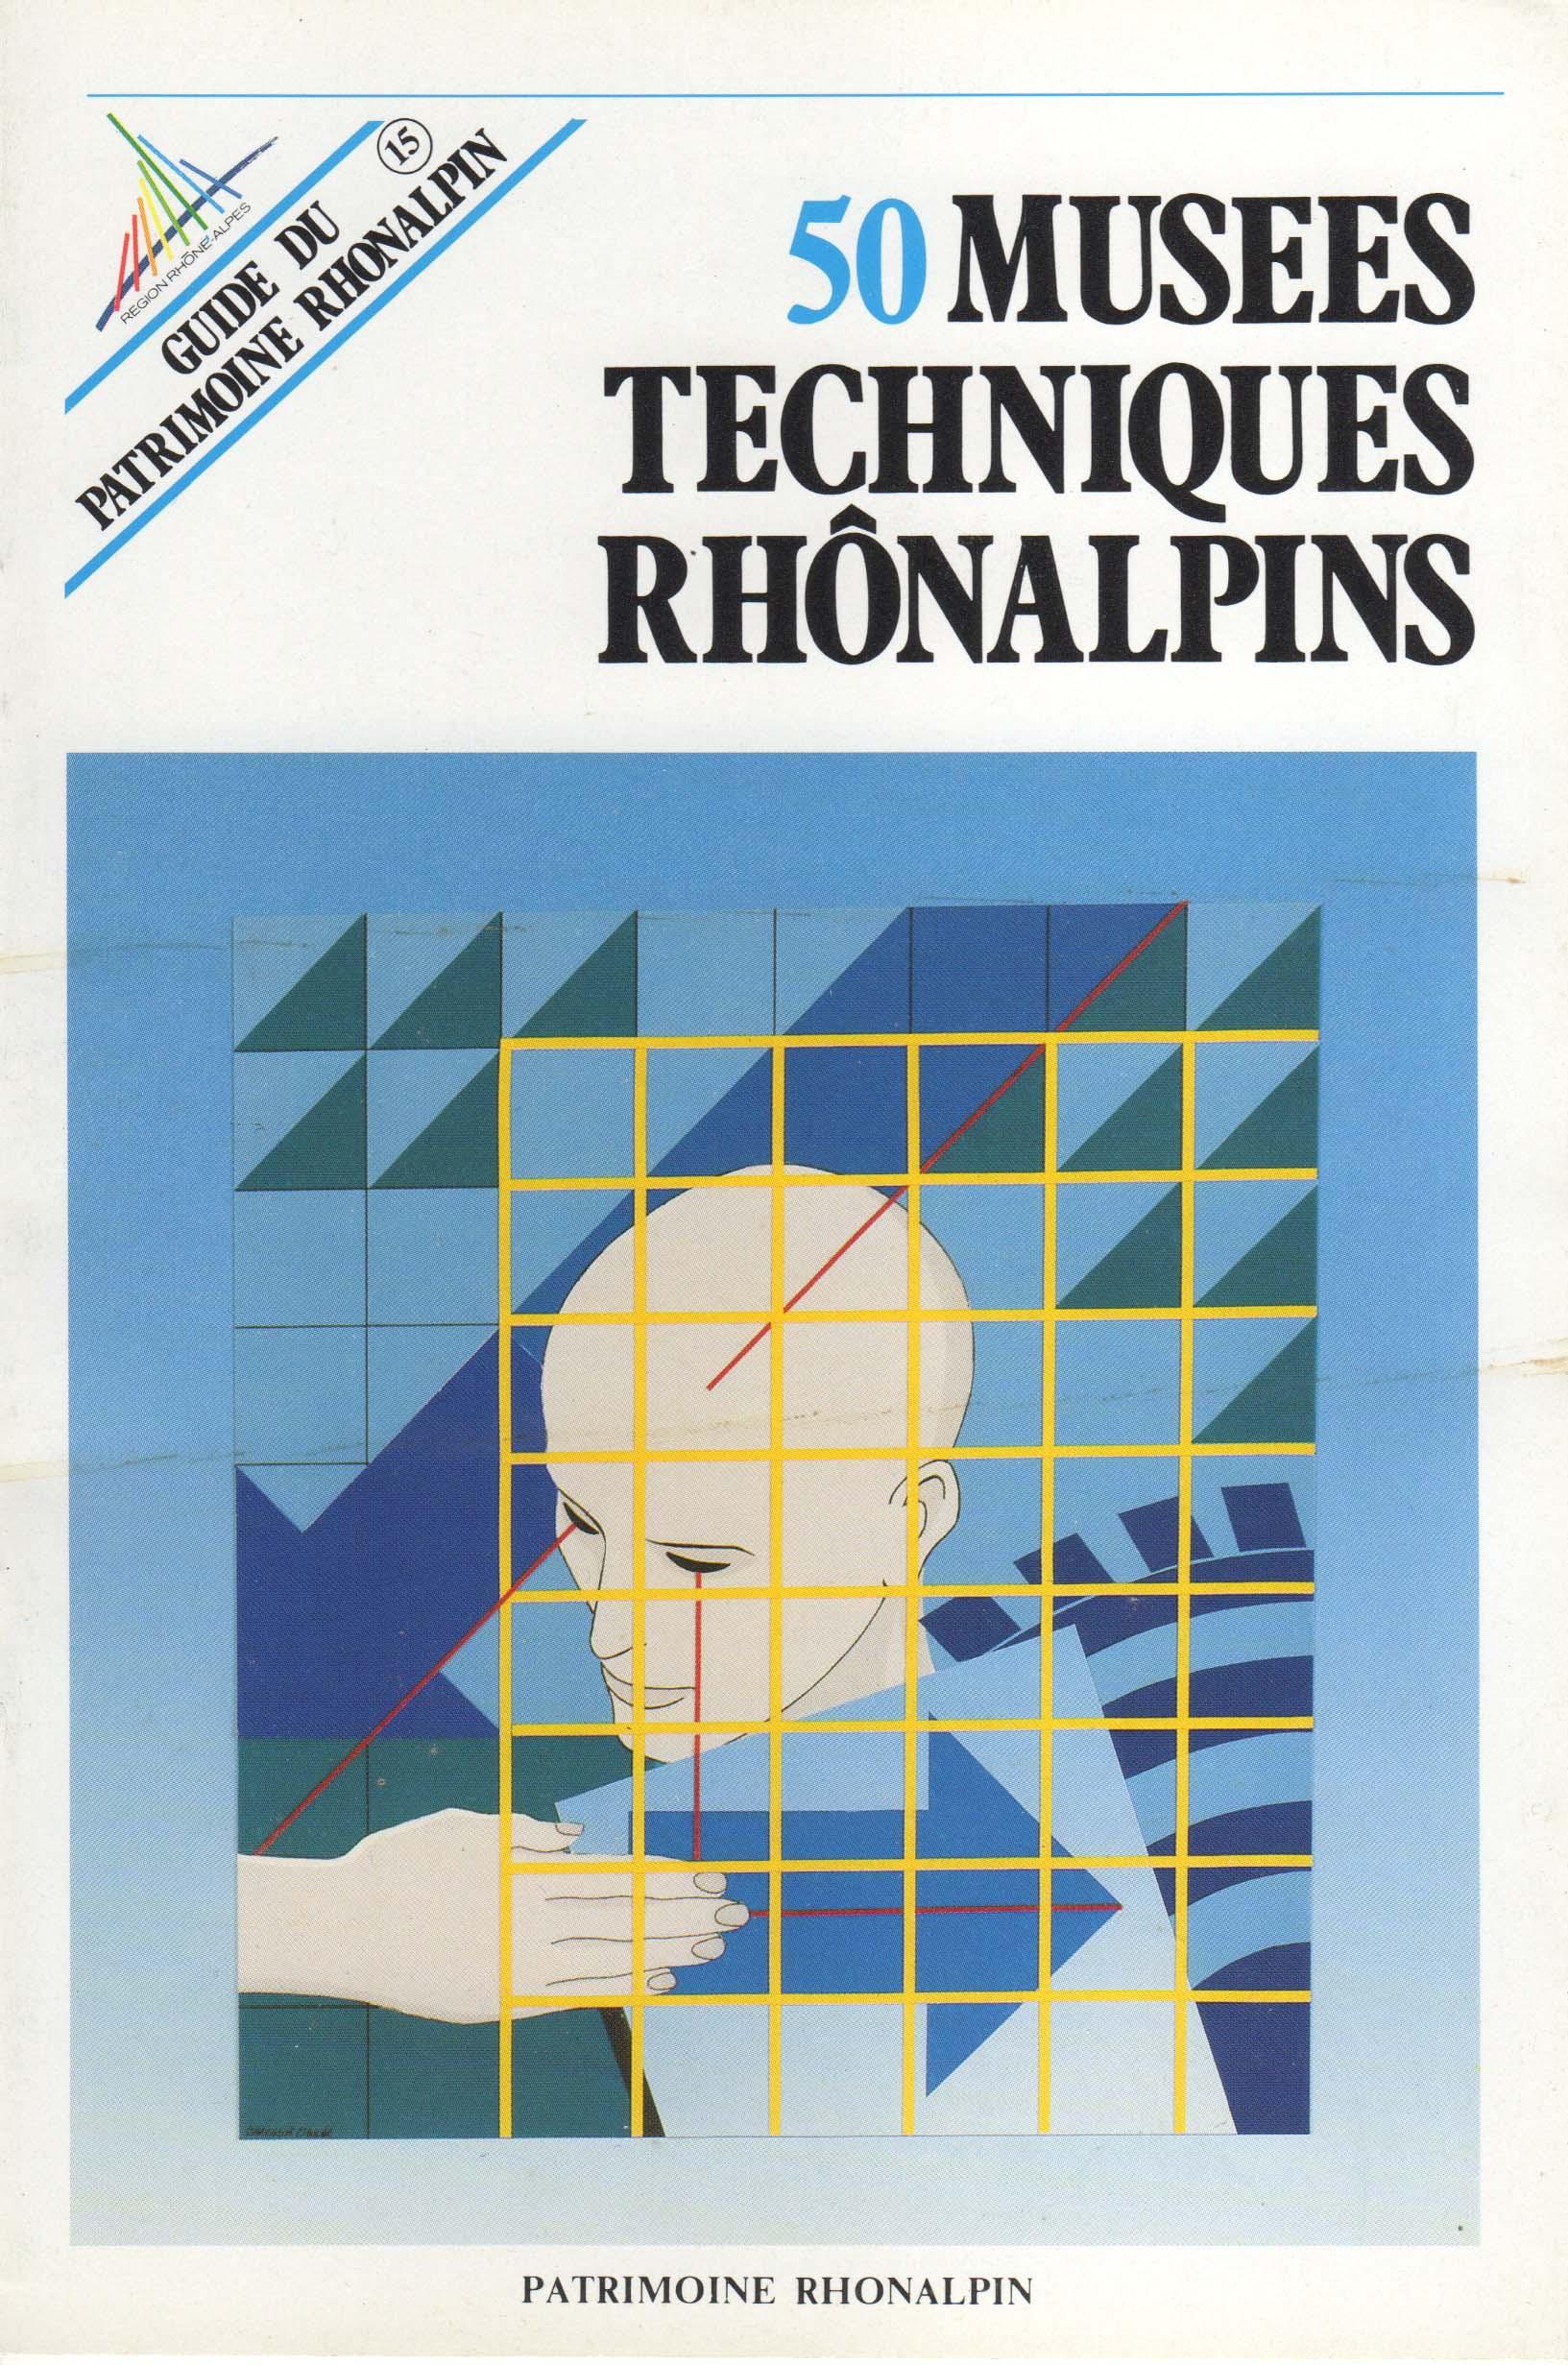 Guide n°15 – 50 musées techniques rhônalpins